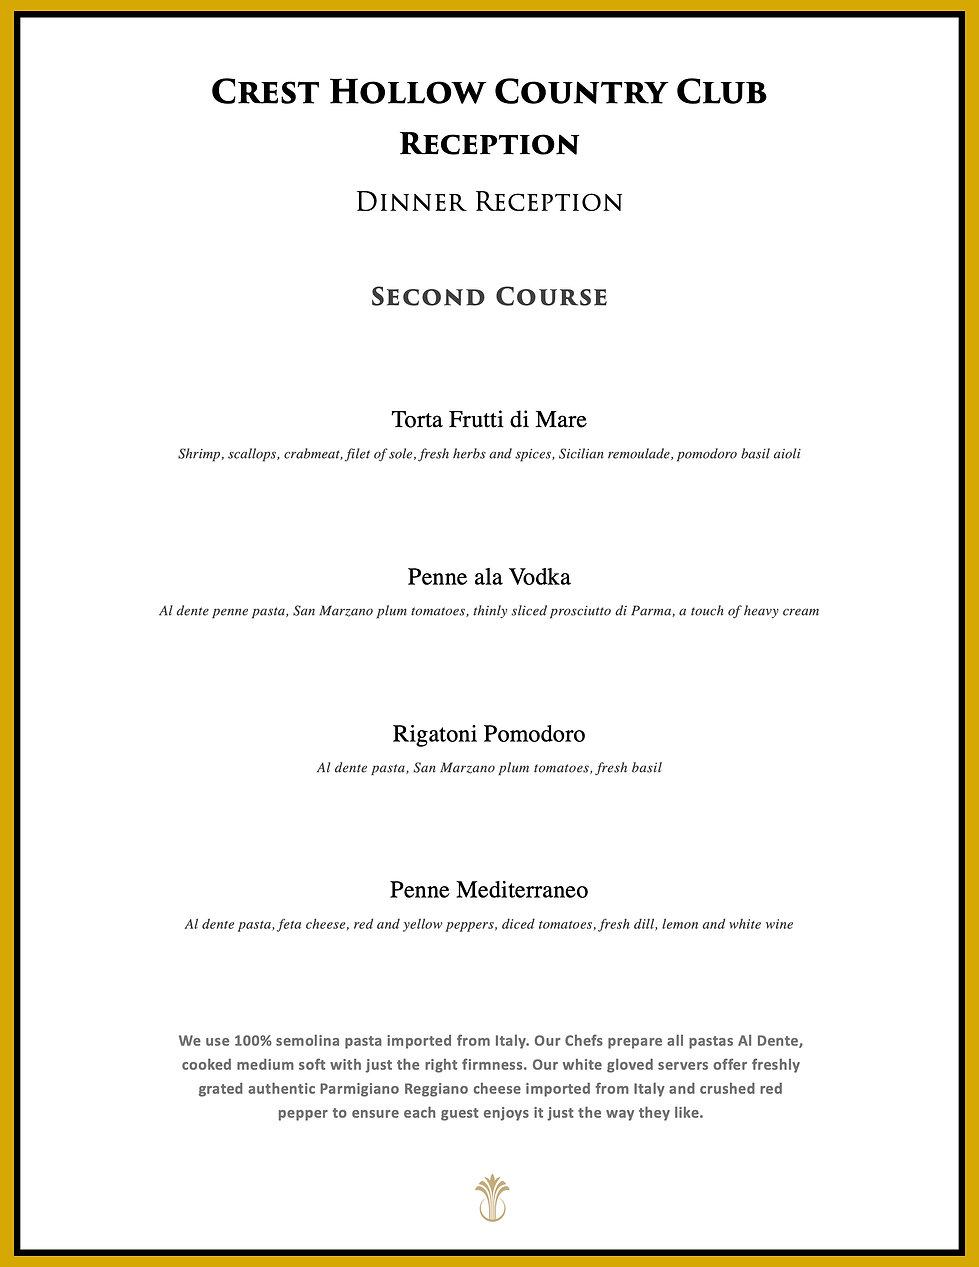 Reception Menu - Page 9.jpg